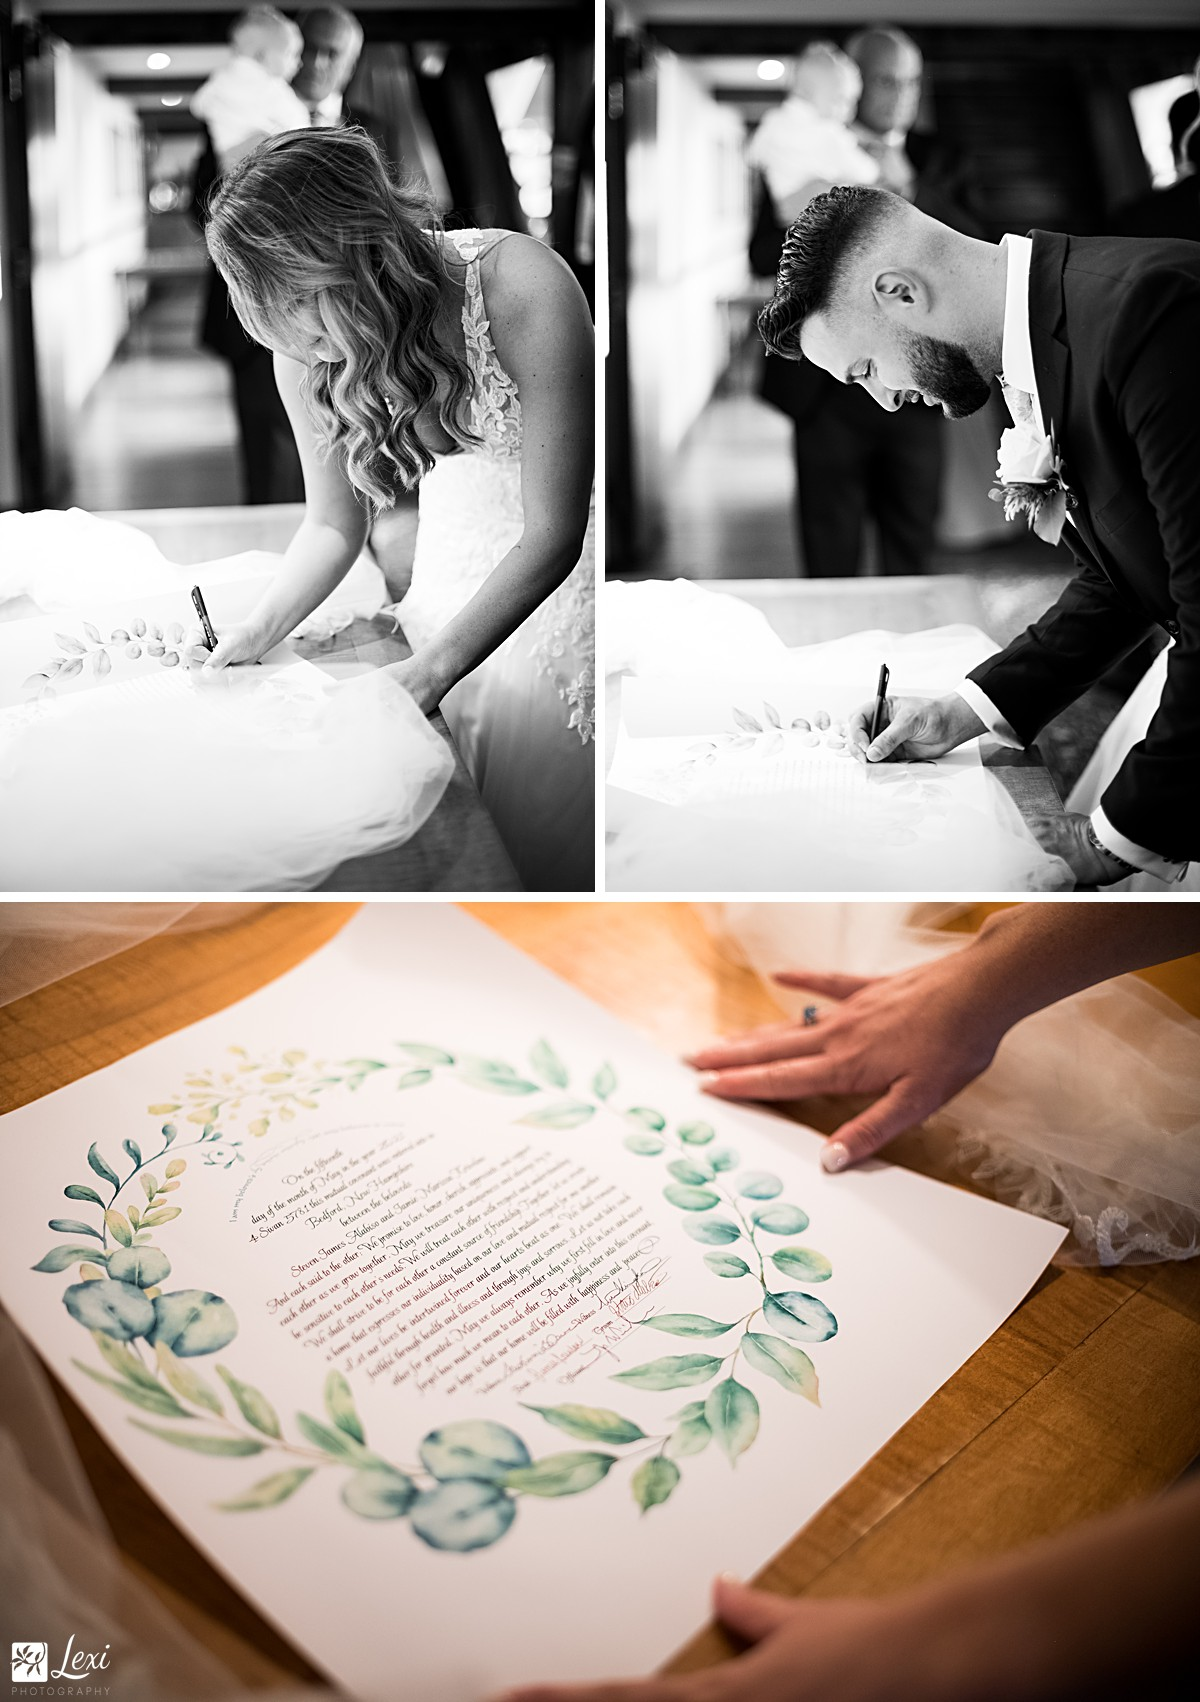 bedford-village-inn-wedding-signing-ketubah.jpg